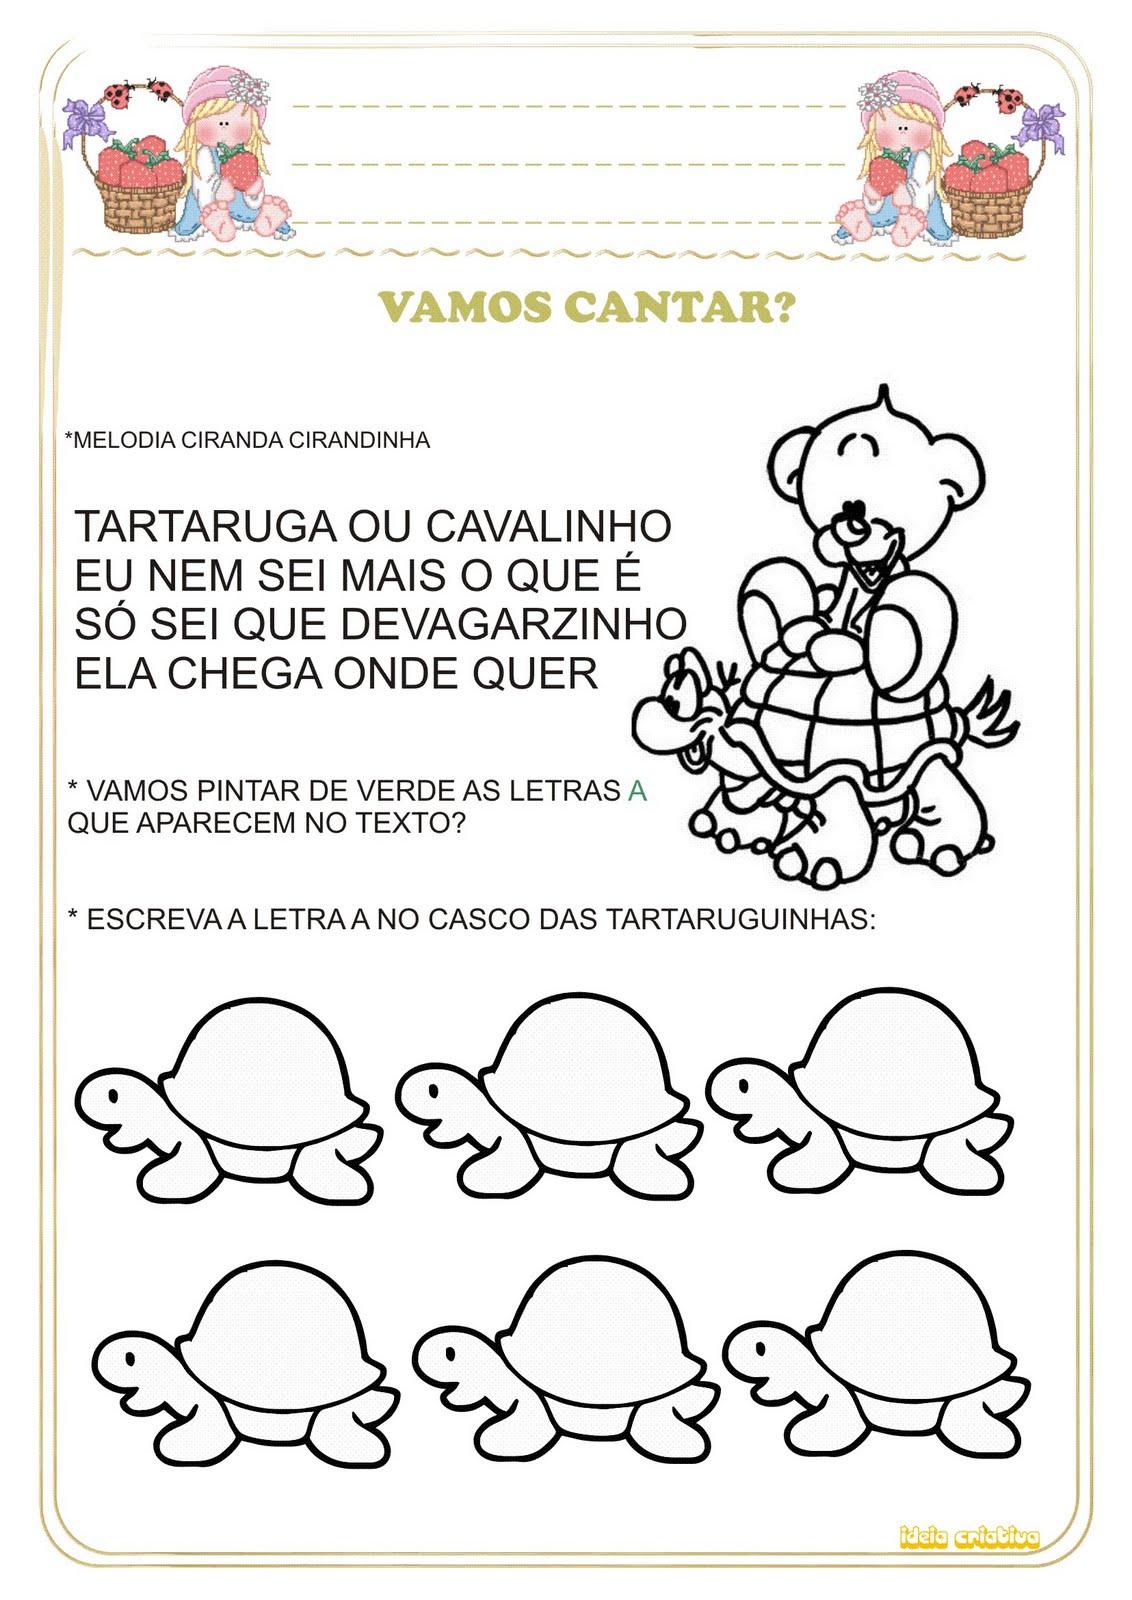 Excepcional Atividade Cantiga de Roda Ciranda Cirandinha Vogal Divertida  TD12